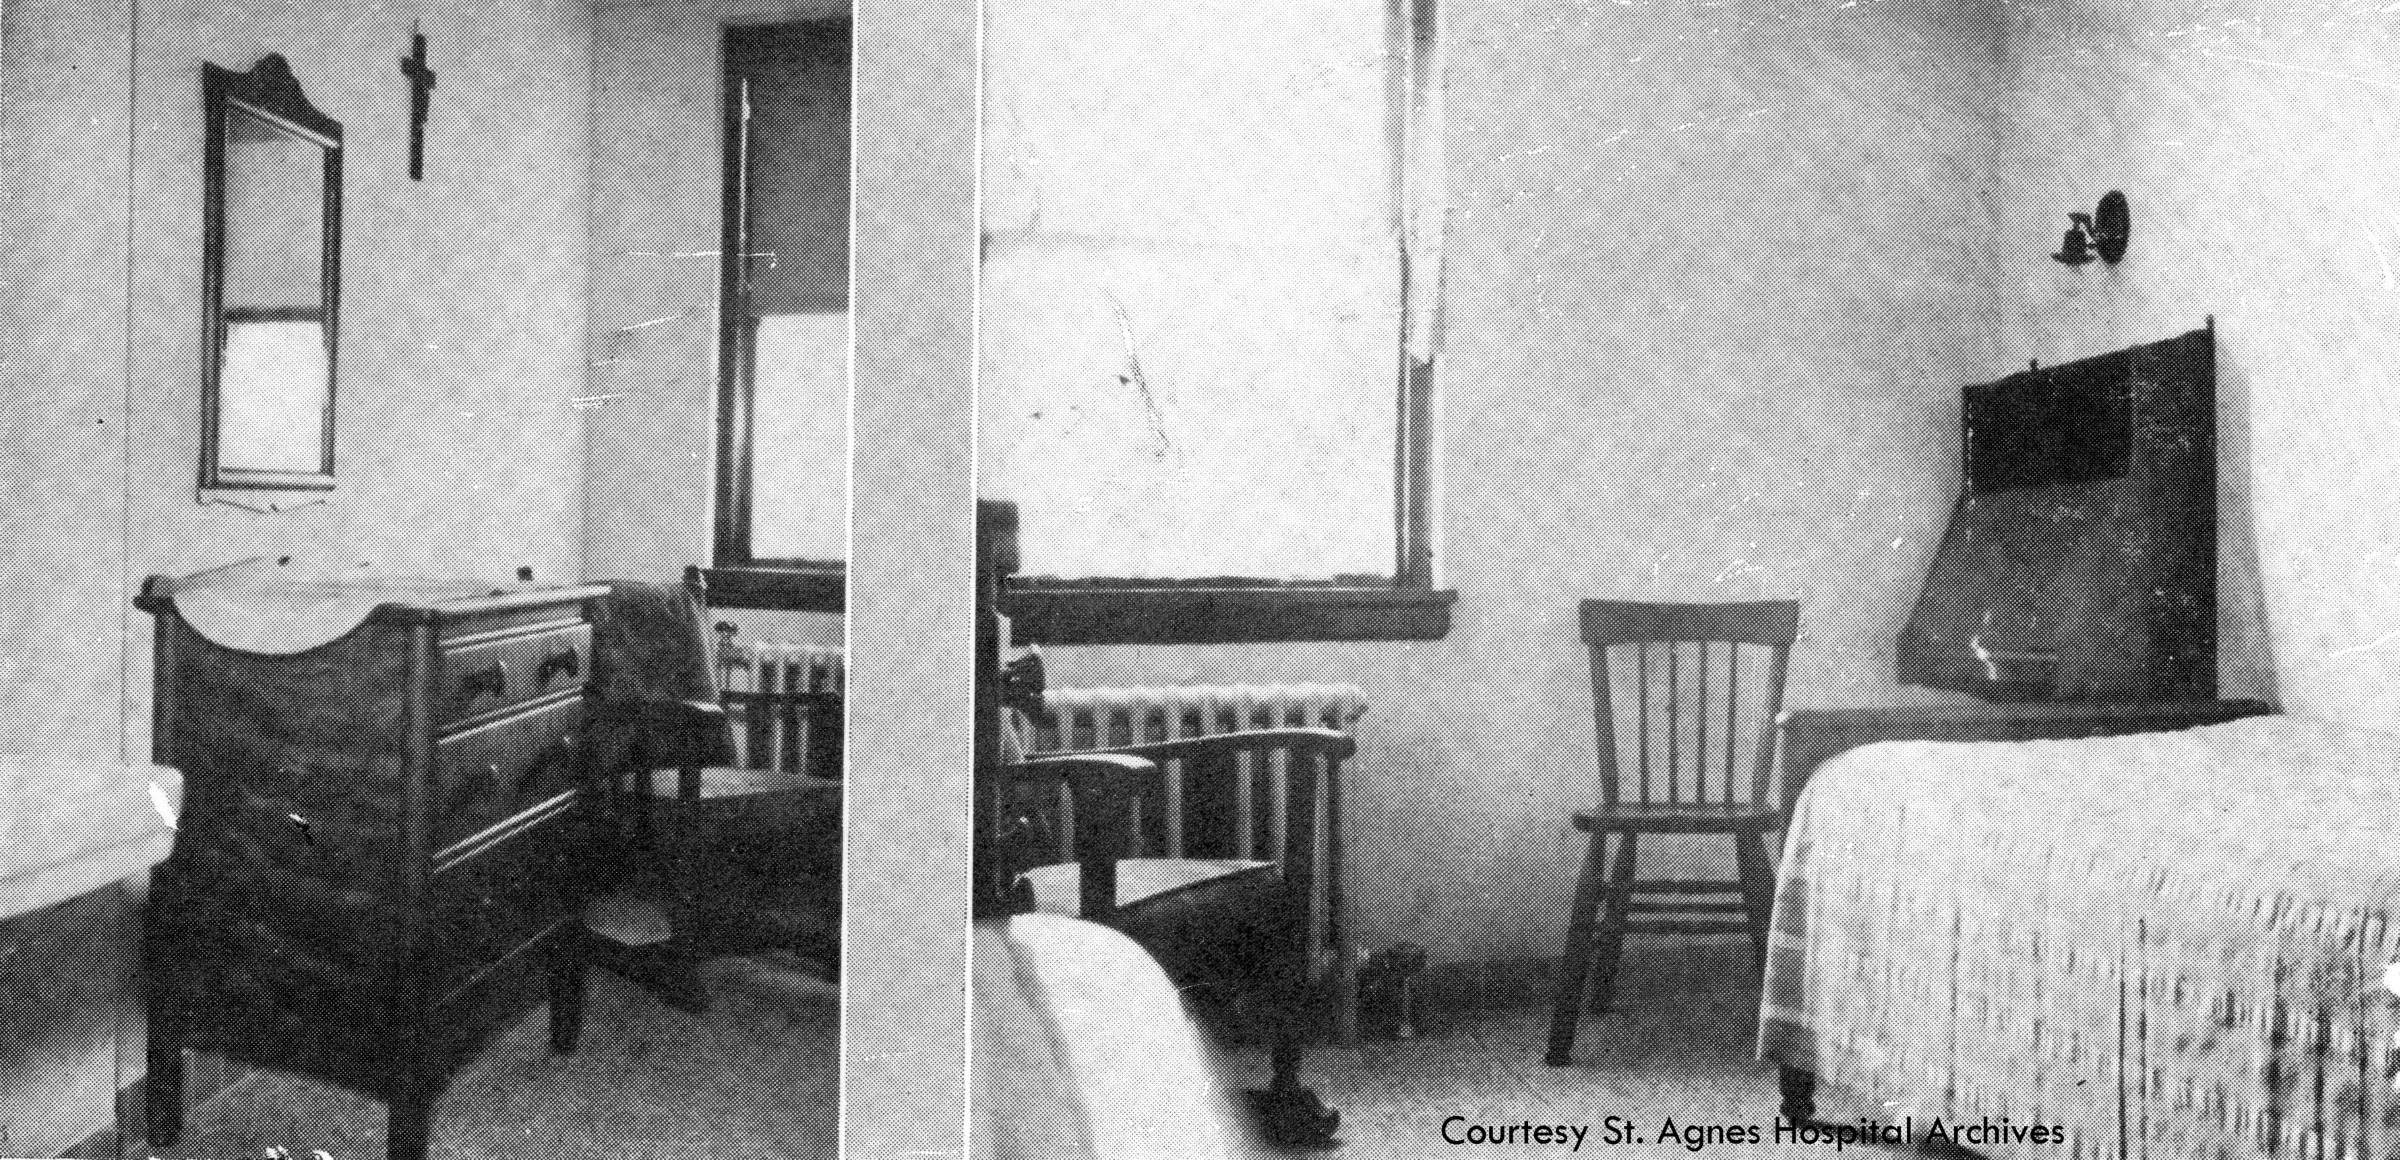 Student dorm rooms at St. Agnes School of Nursing, c. 1931.